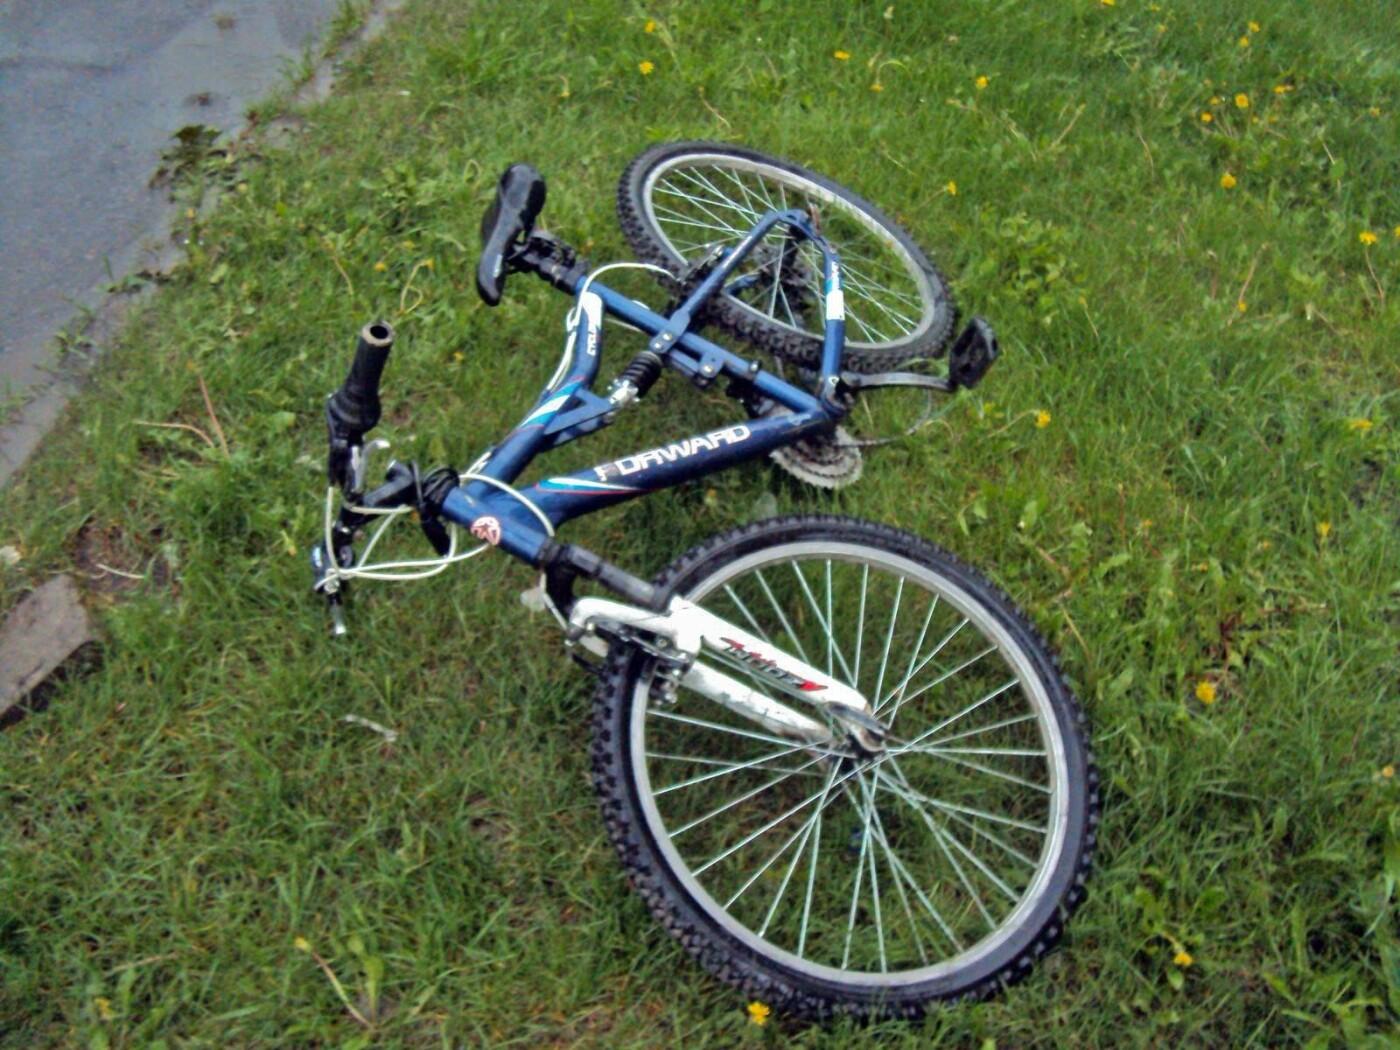 На севере Тамбова 11-летний велосипедист попал под колеса машины, фото-1